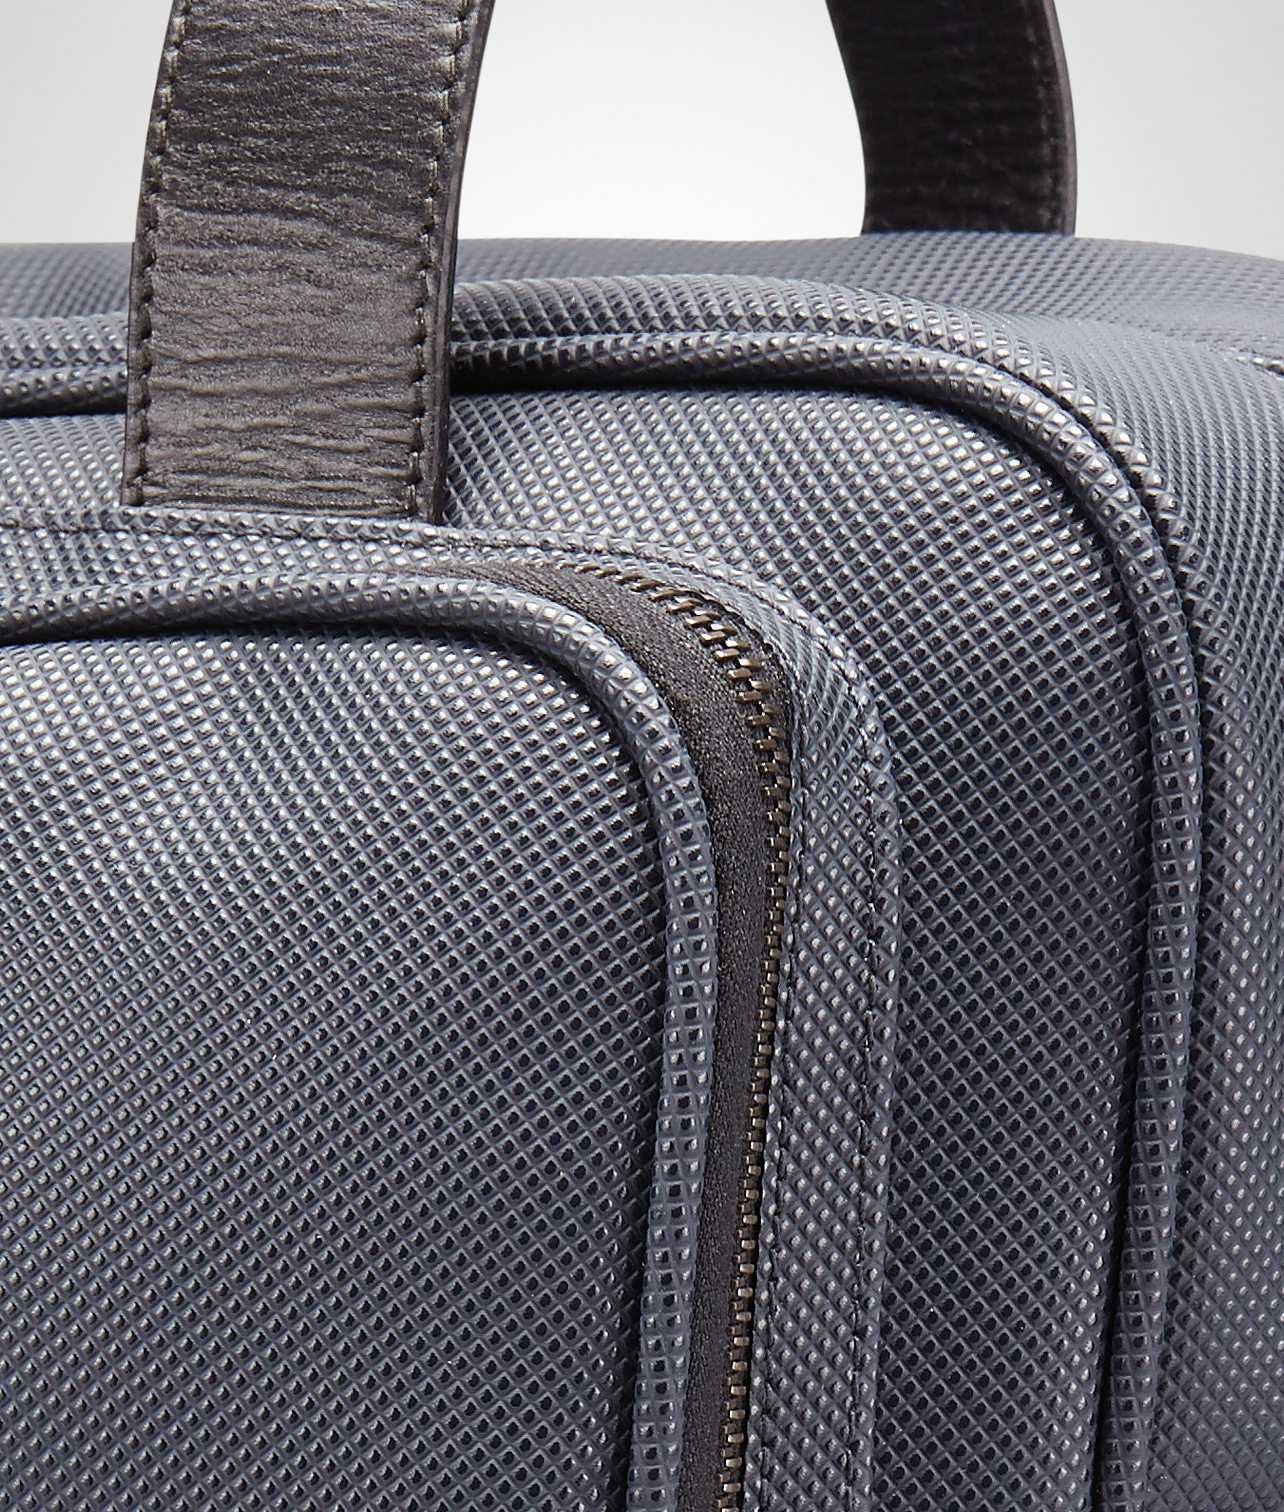 e2573d43a9 Lyst - Bottega Veneta Dark Navy Marcopolo Carry On Bag in Blue